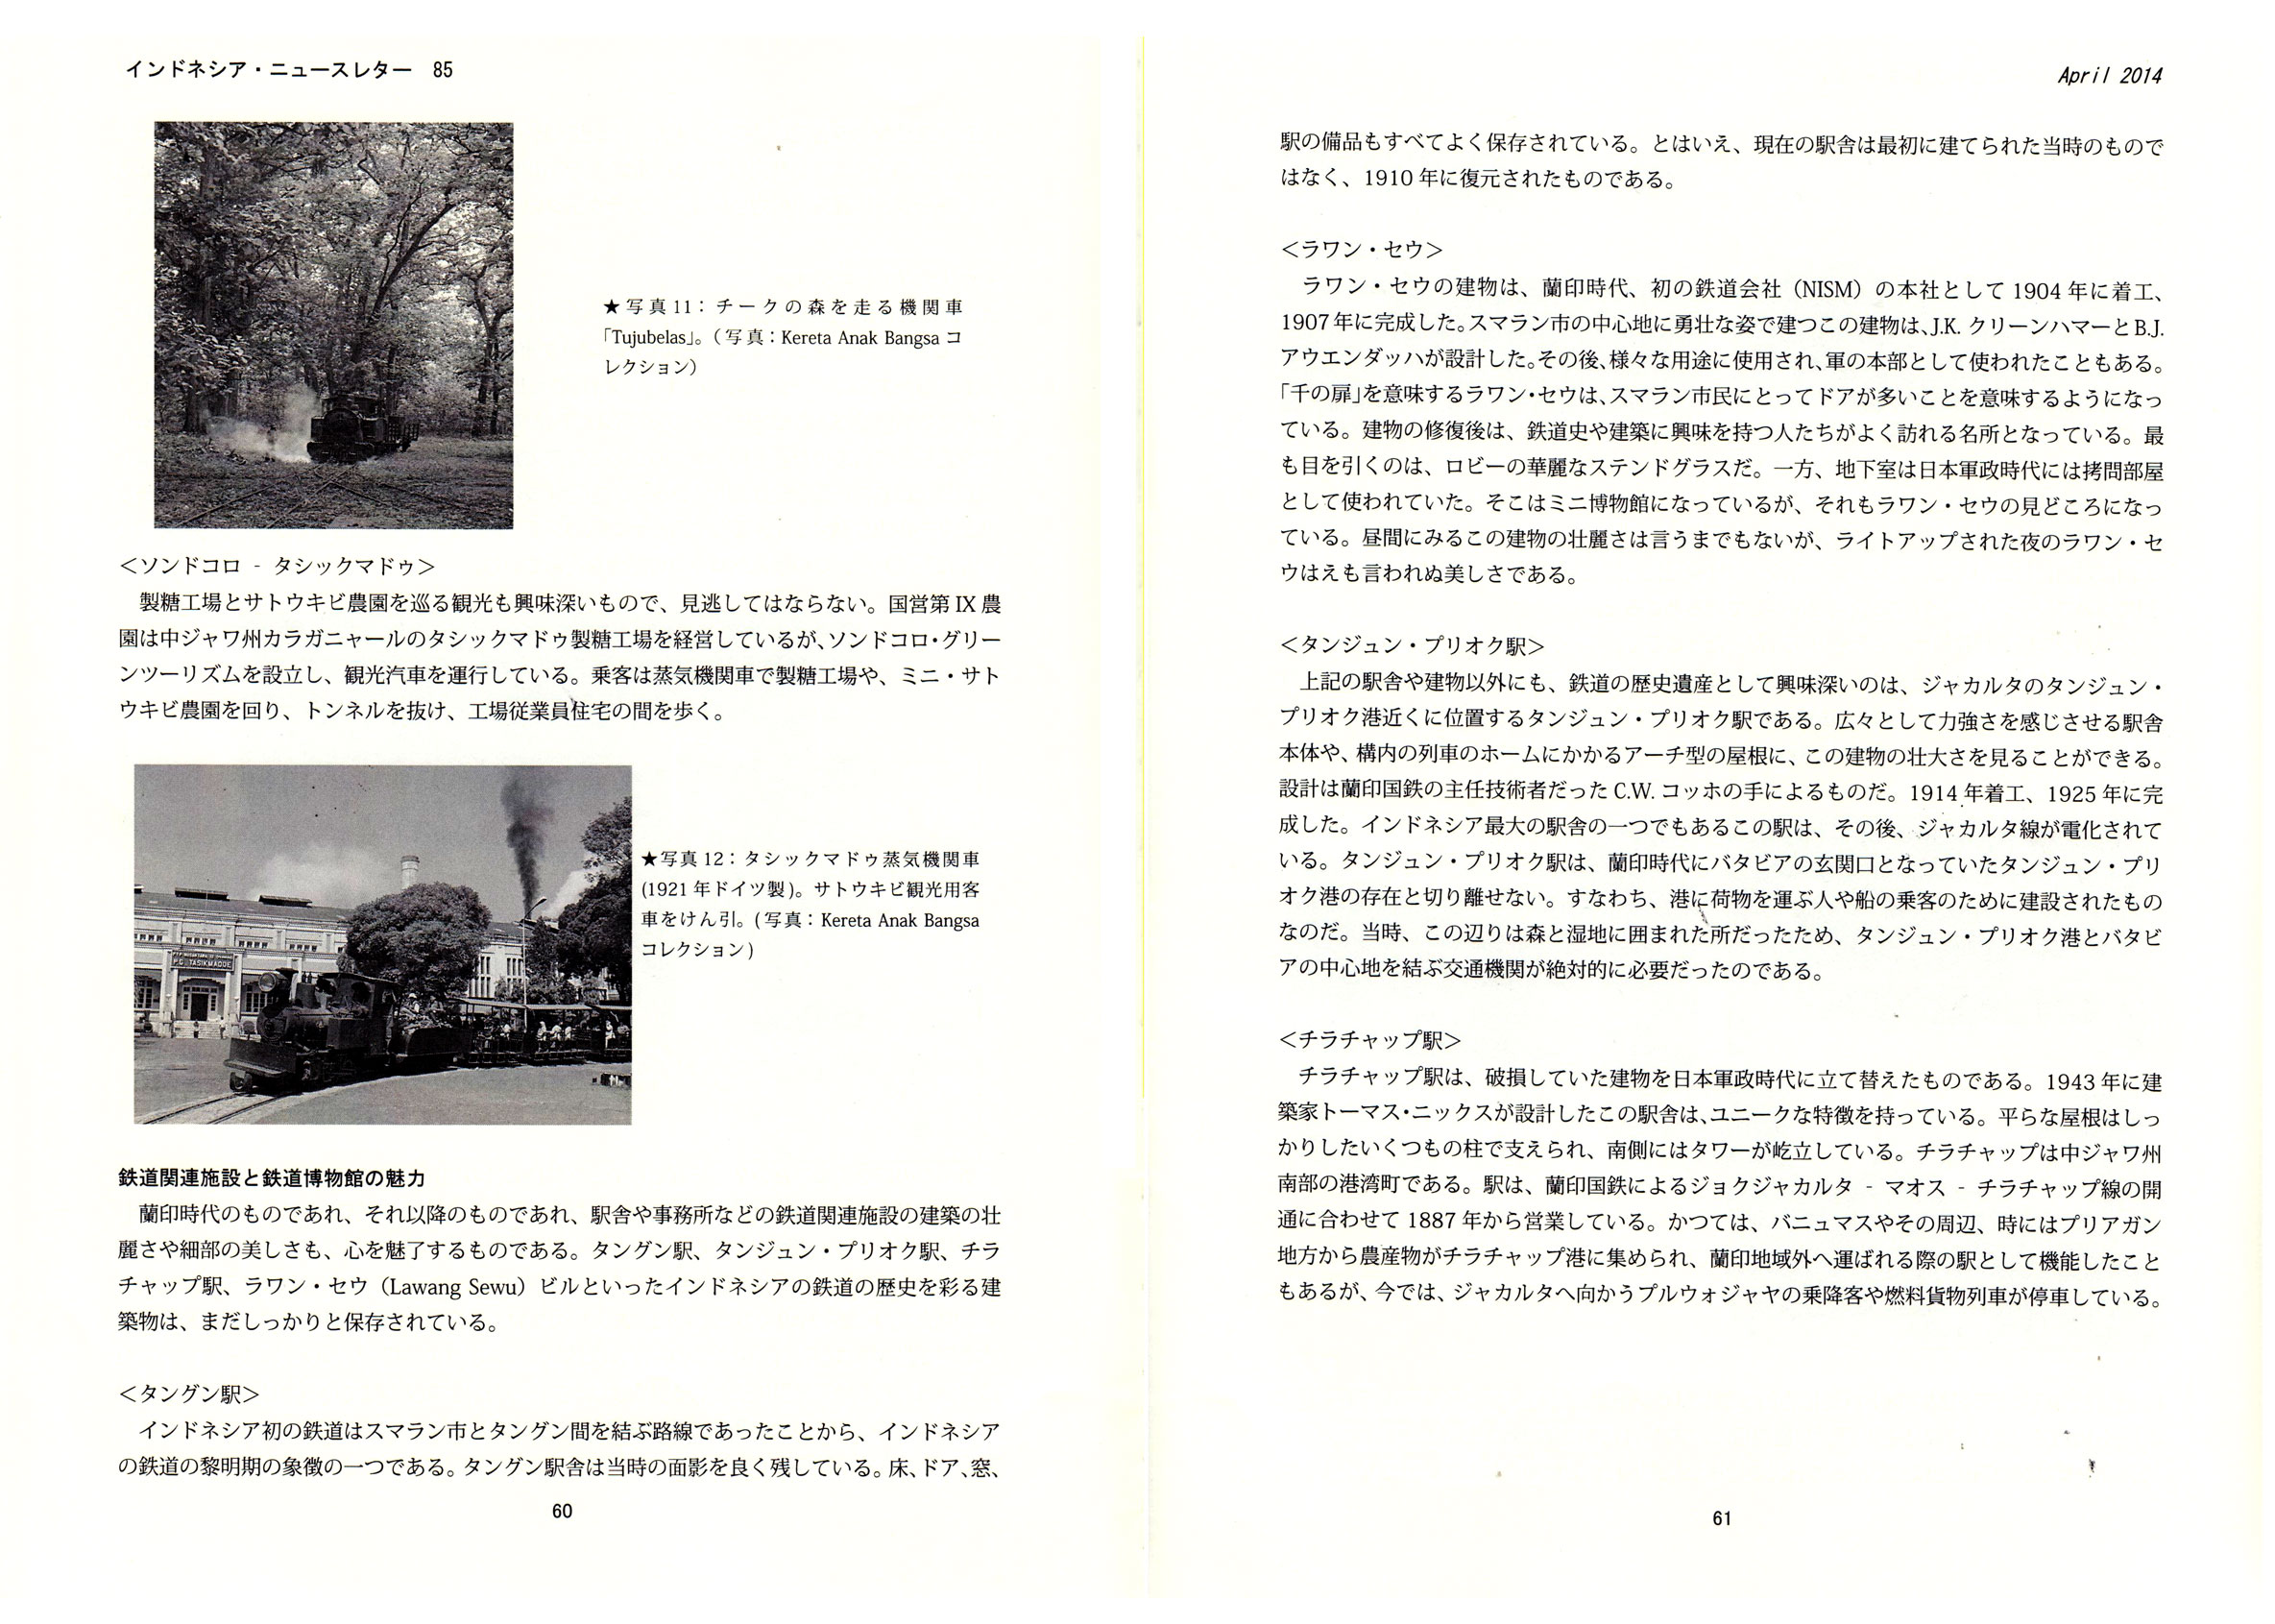 Halaman 60-61